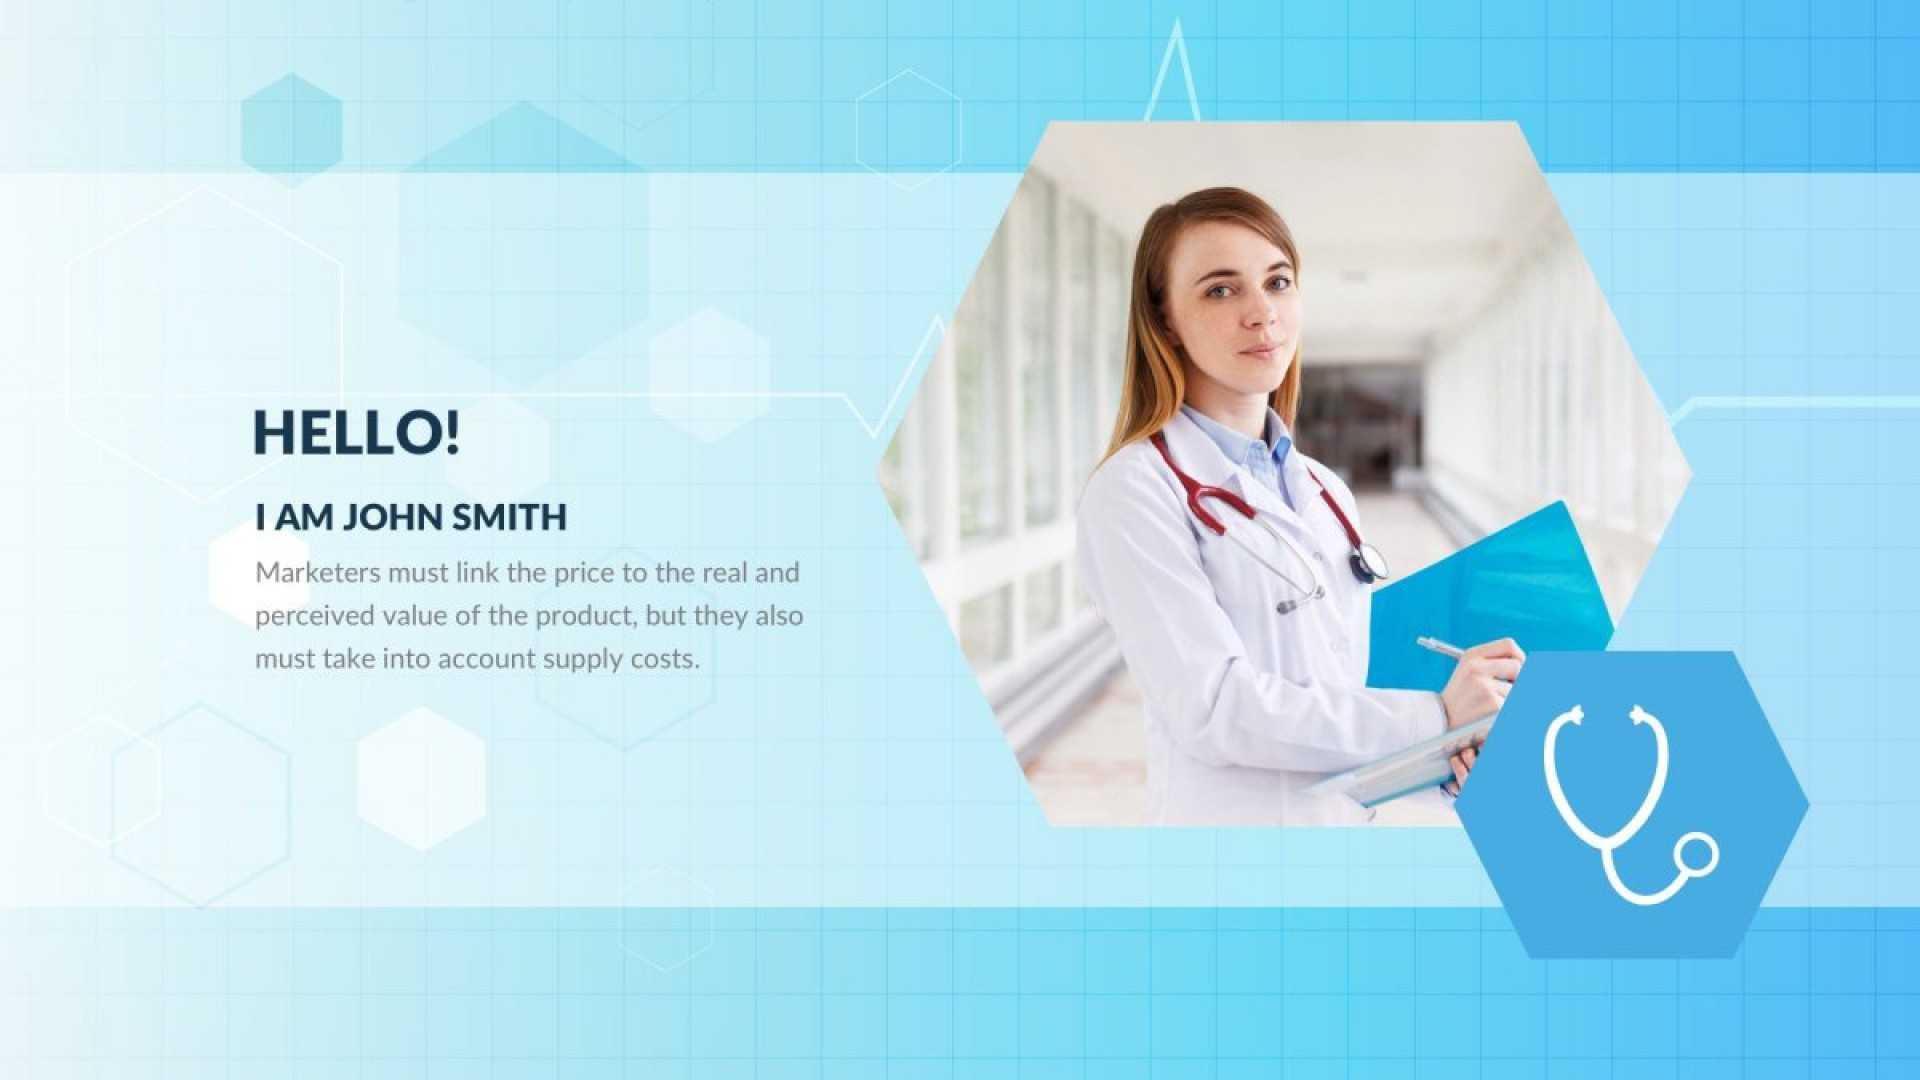 004 Template Ideas Free Nursing Powerpoint Templates Alpha Within Free Nursing Powerpoint Templates